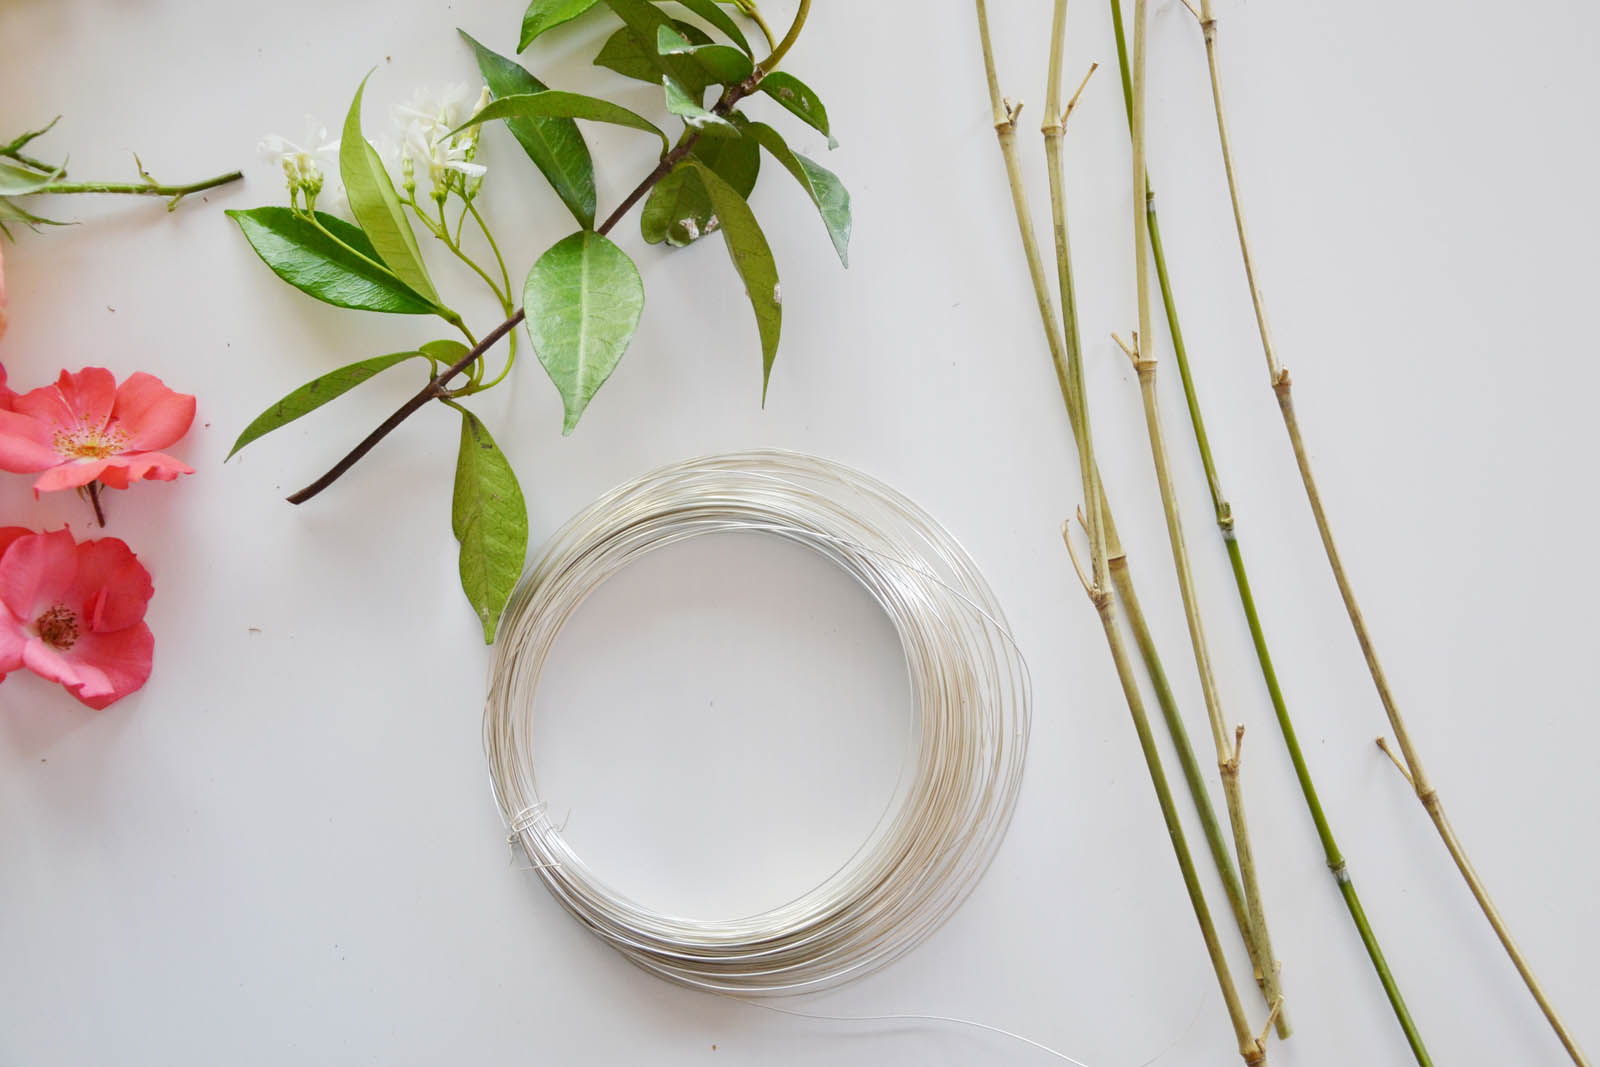 Ghirlanda-Viridea-occorrente